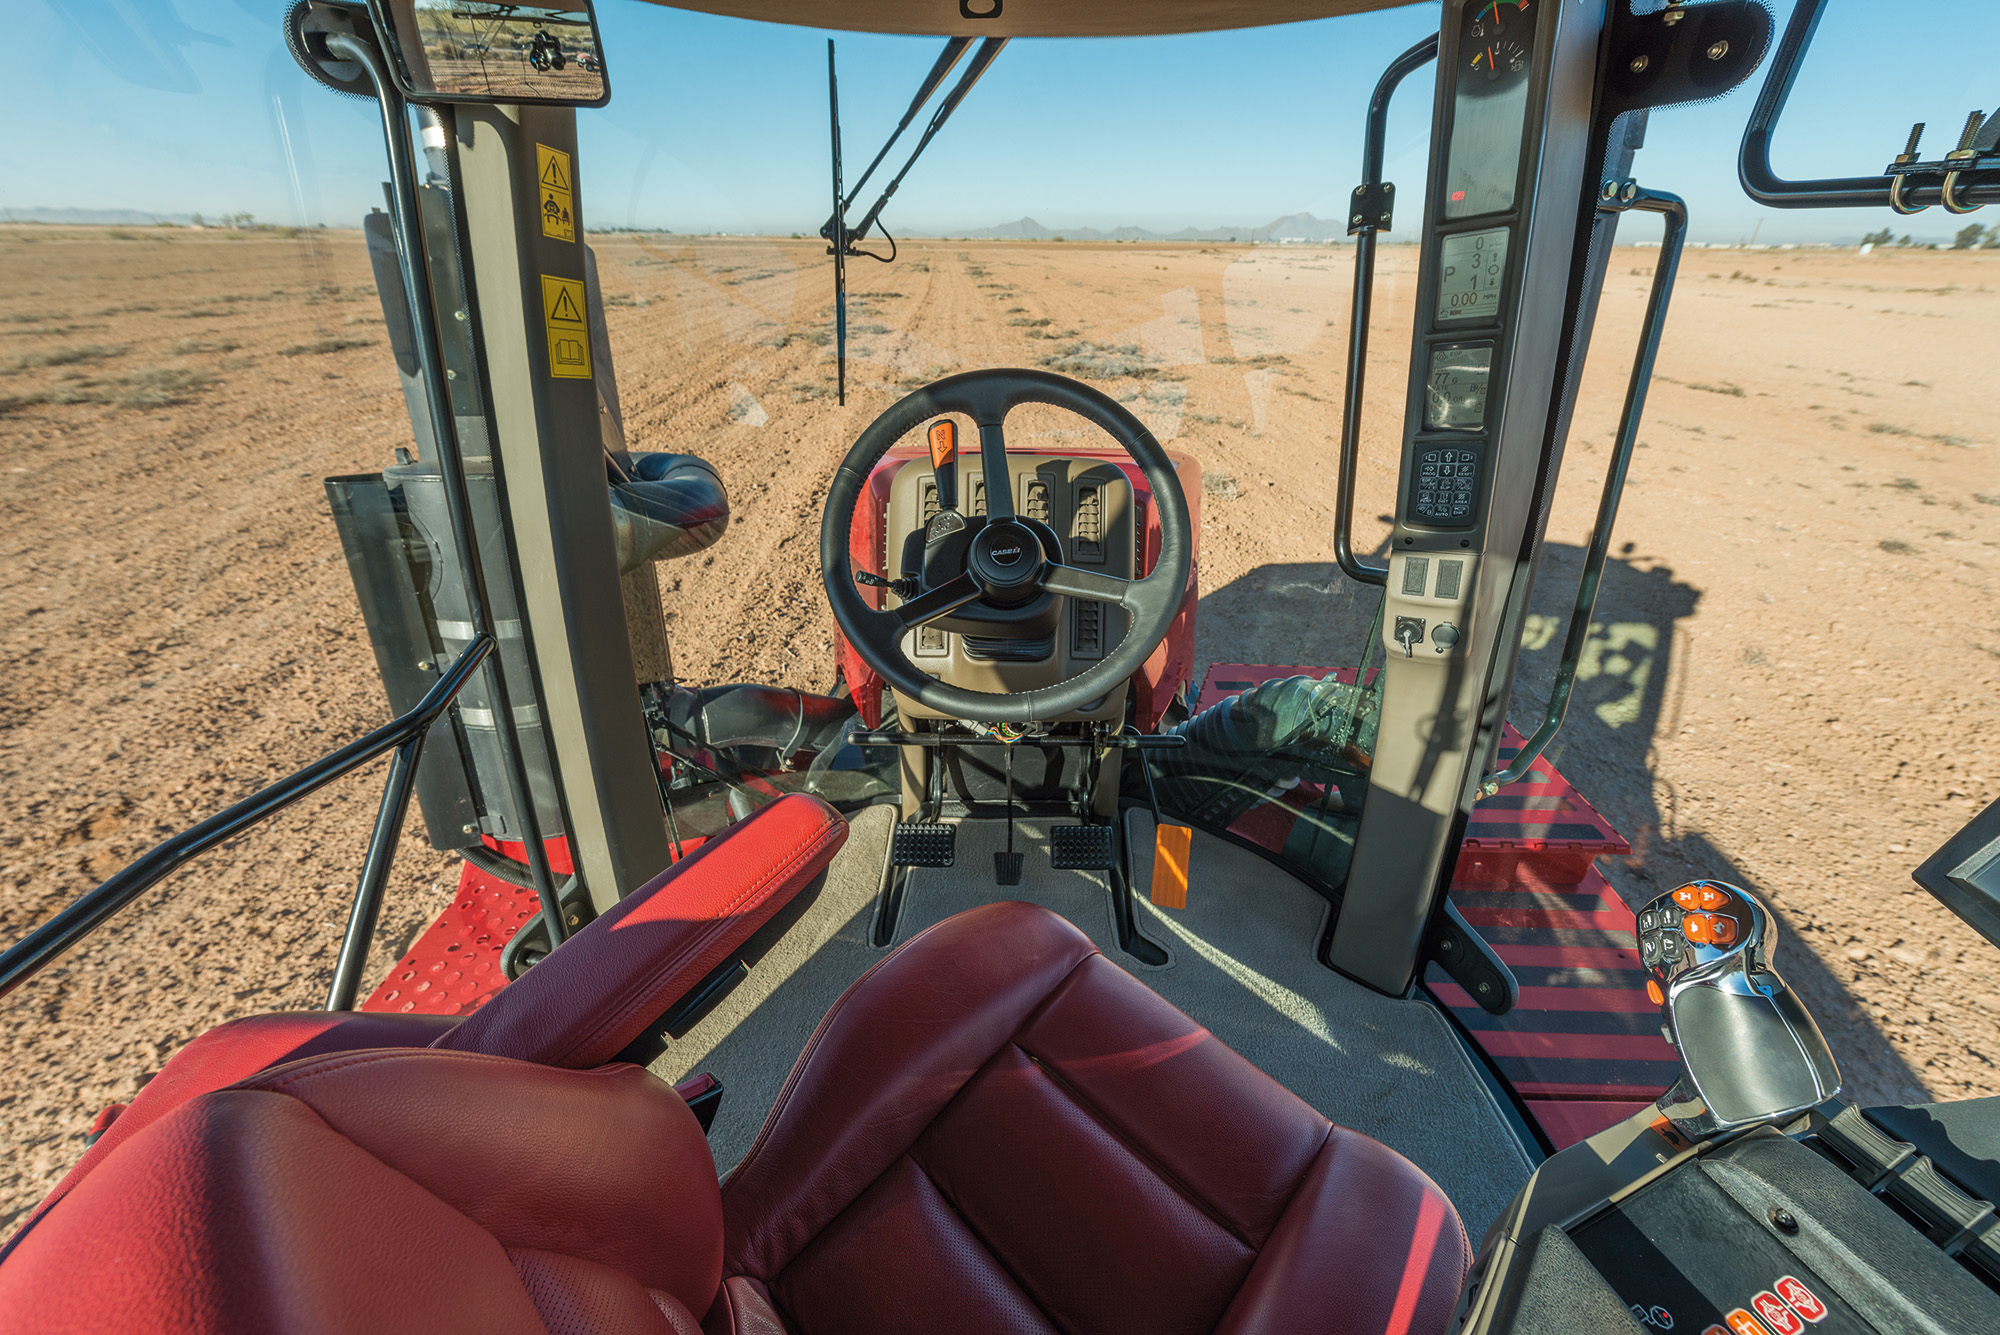 Steiger_Quadtrac_interior_0021_01 14?width=1280&height=546 steiger series 4wd row crop farming tractors case ih  at mifinder.co